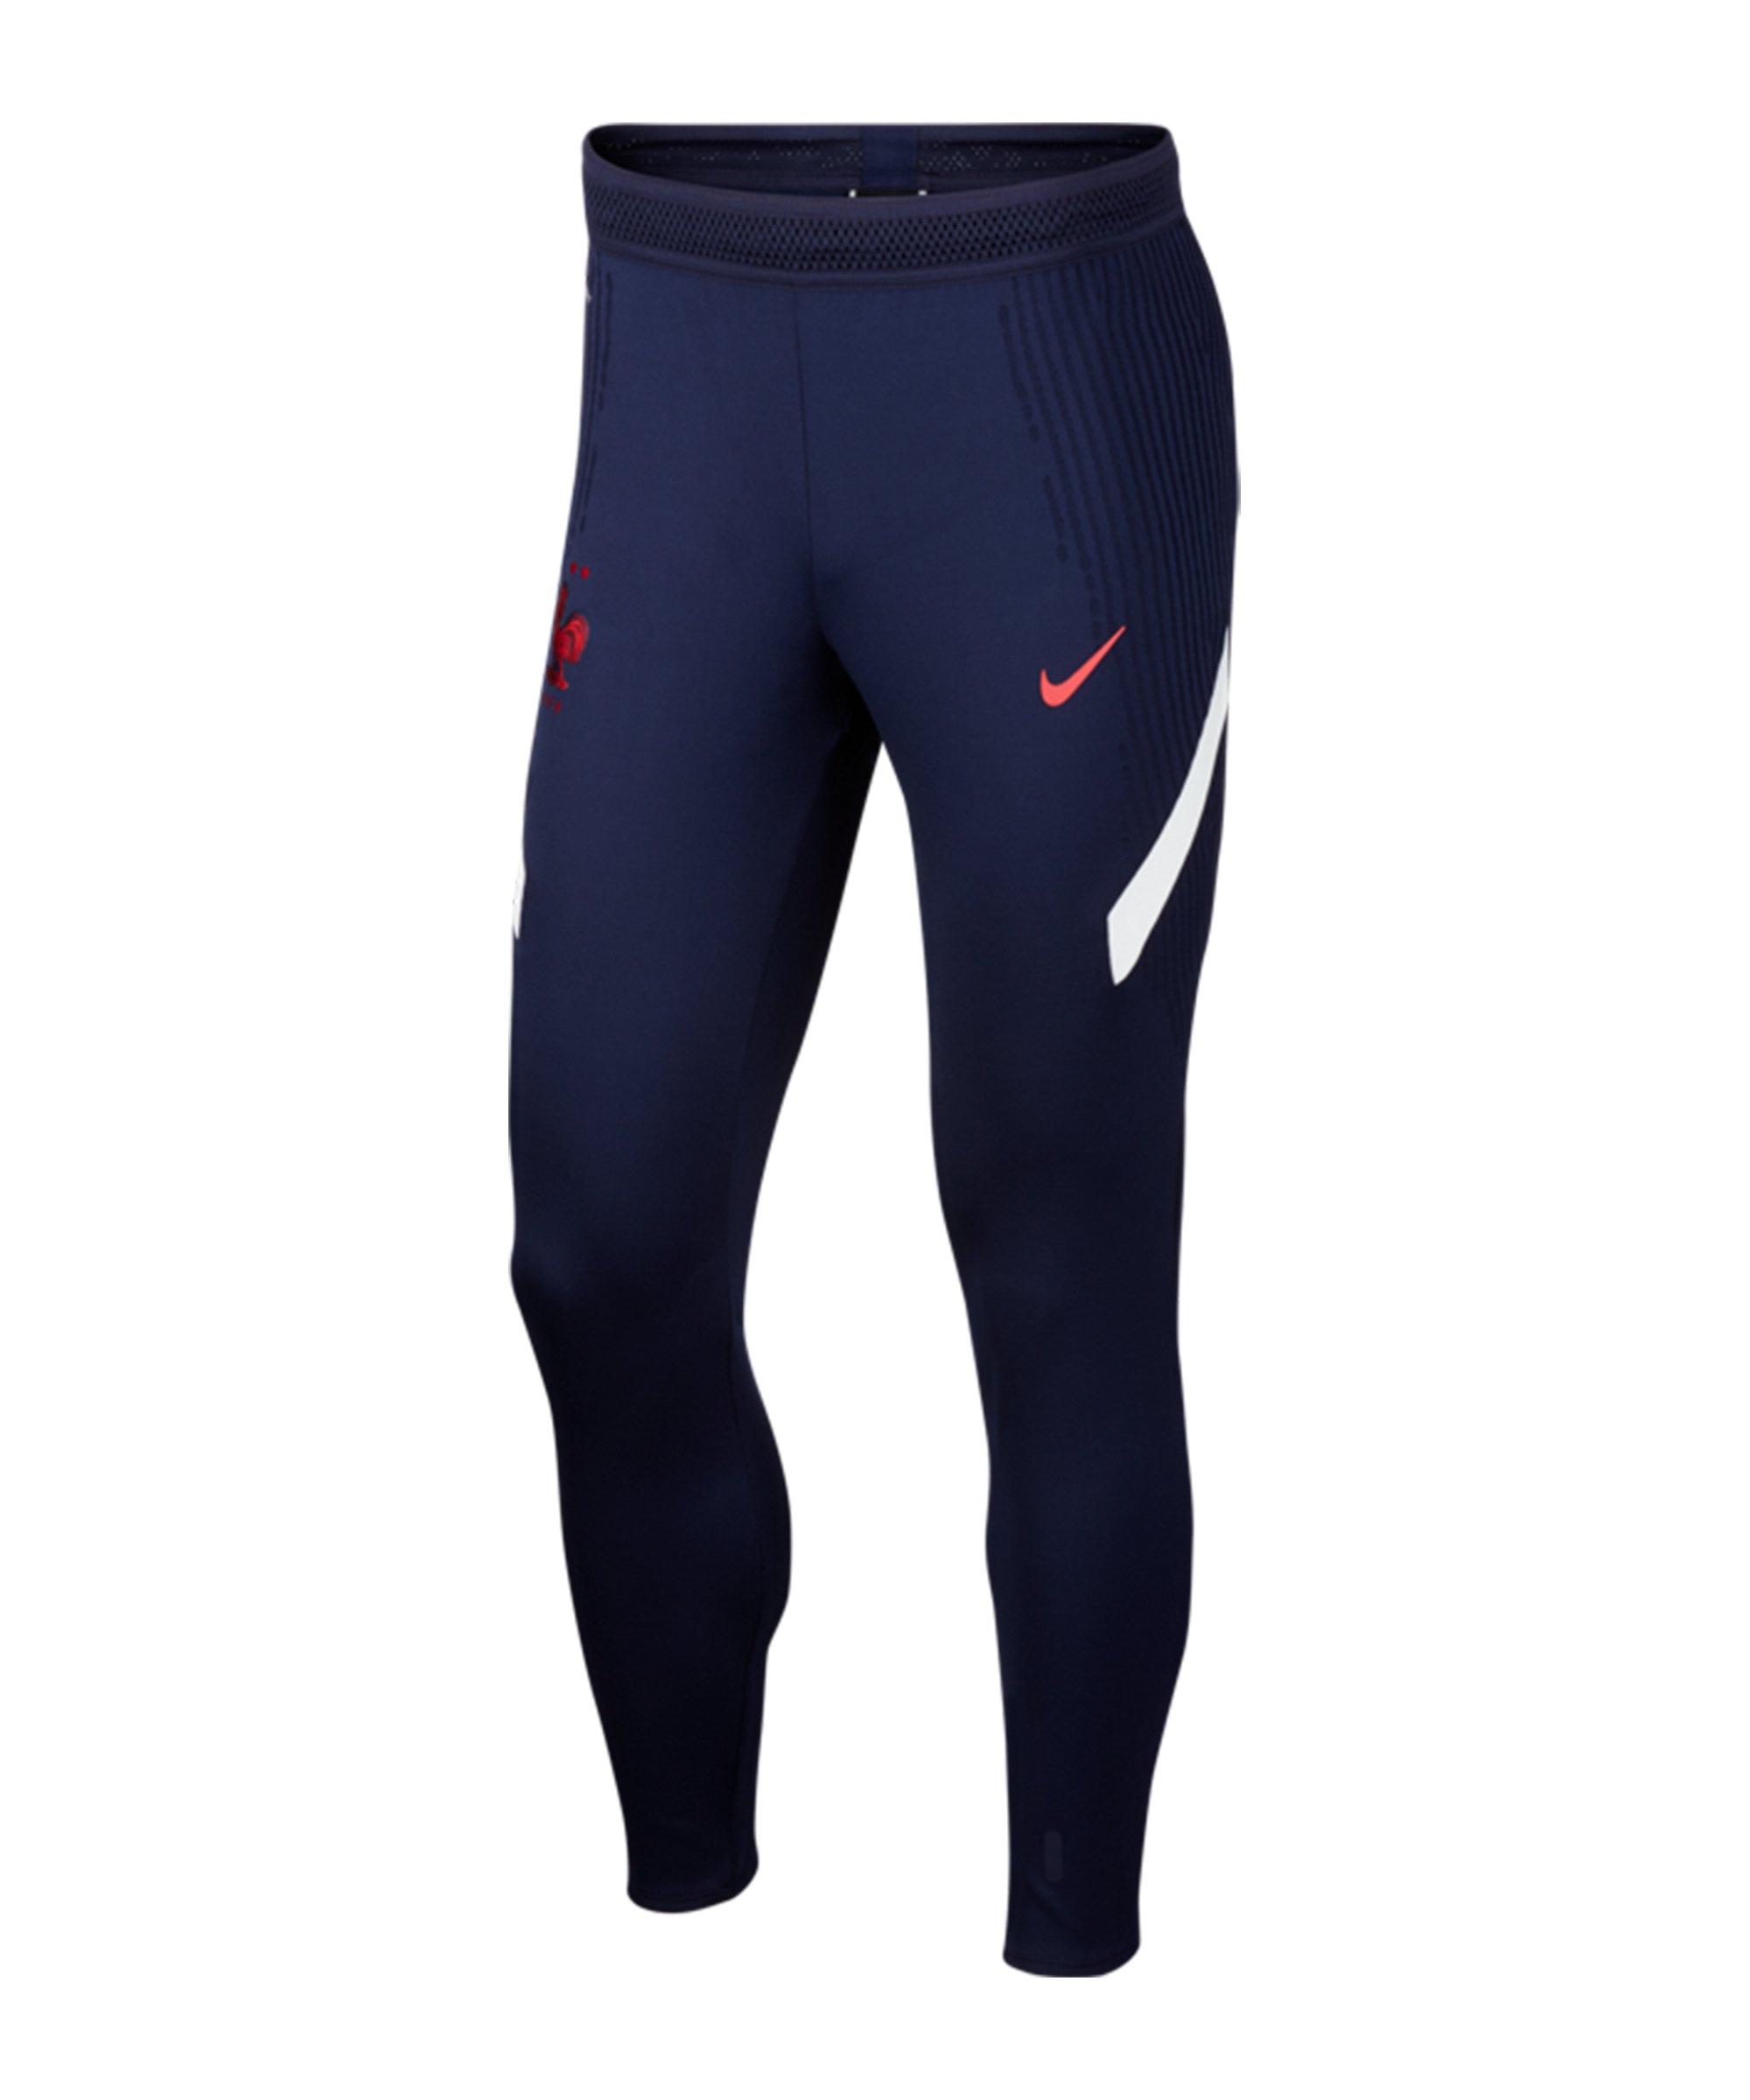 Nike Frankreich Vaporknit Pant Hose F498 - blau